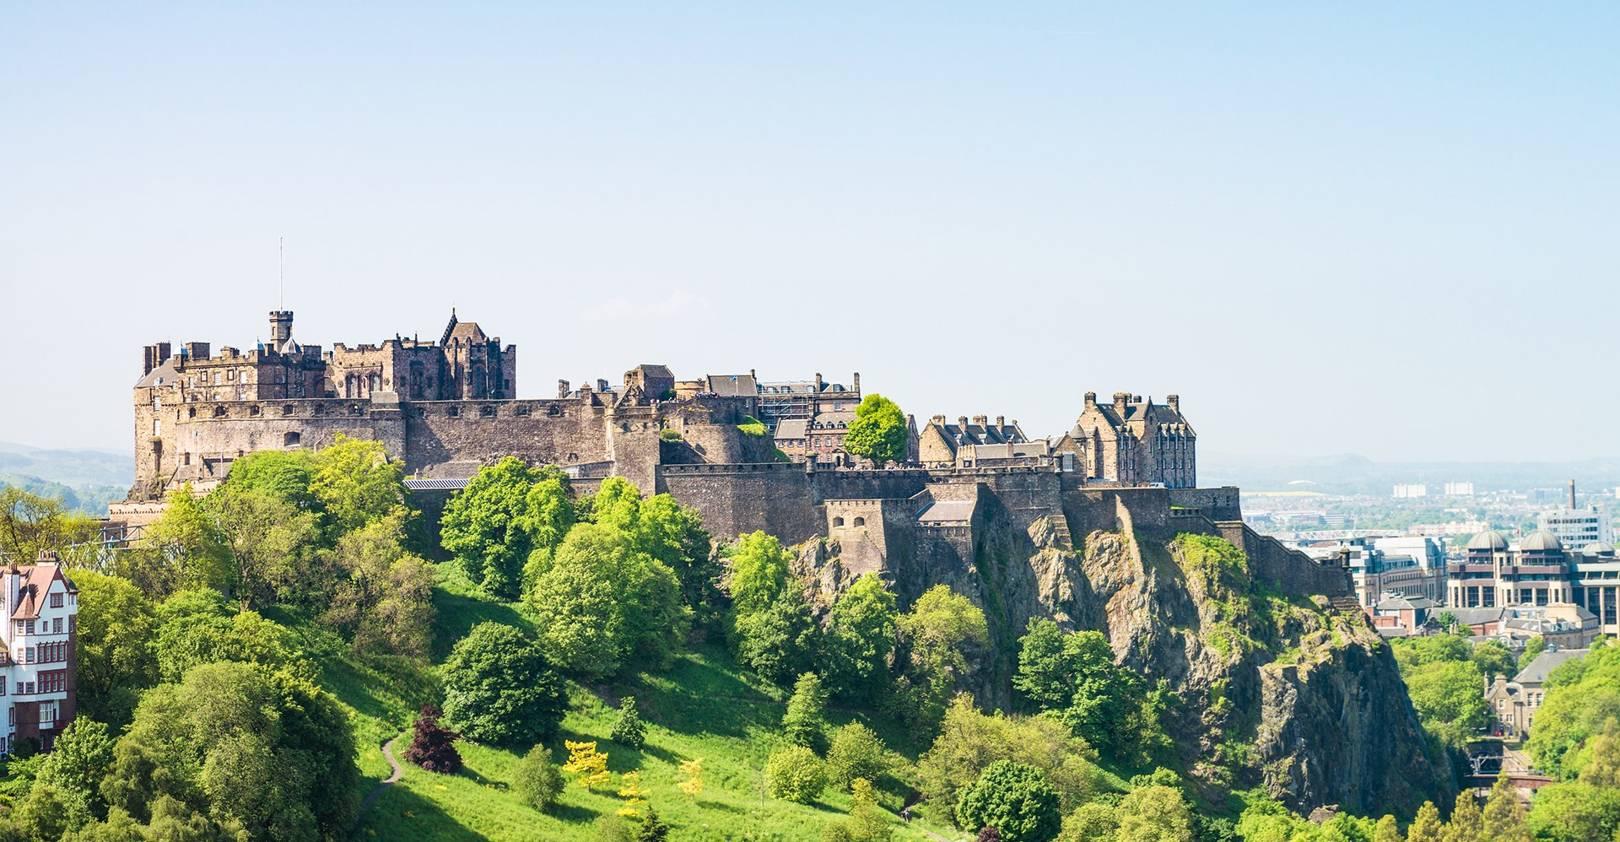 Things to do in Edinburgh: 18 amazing ideas